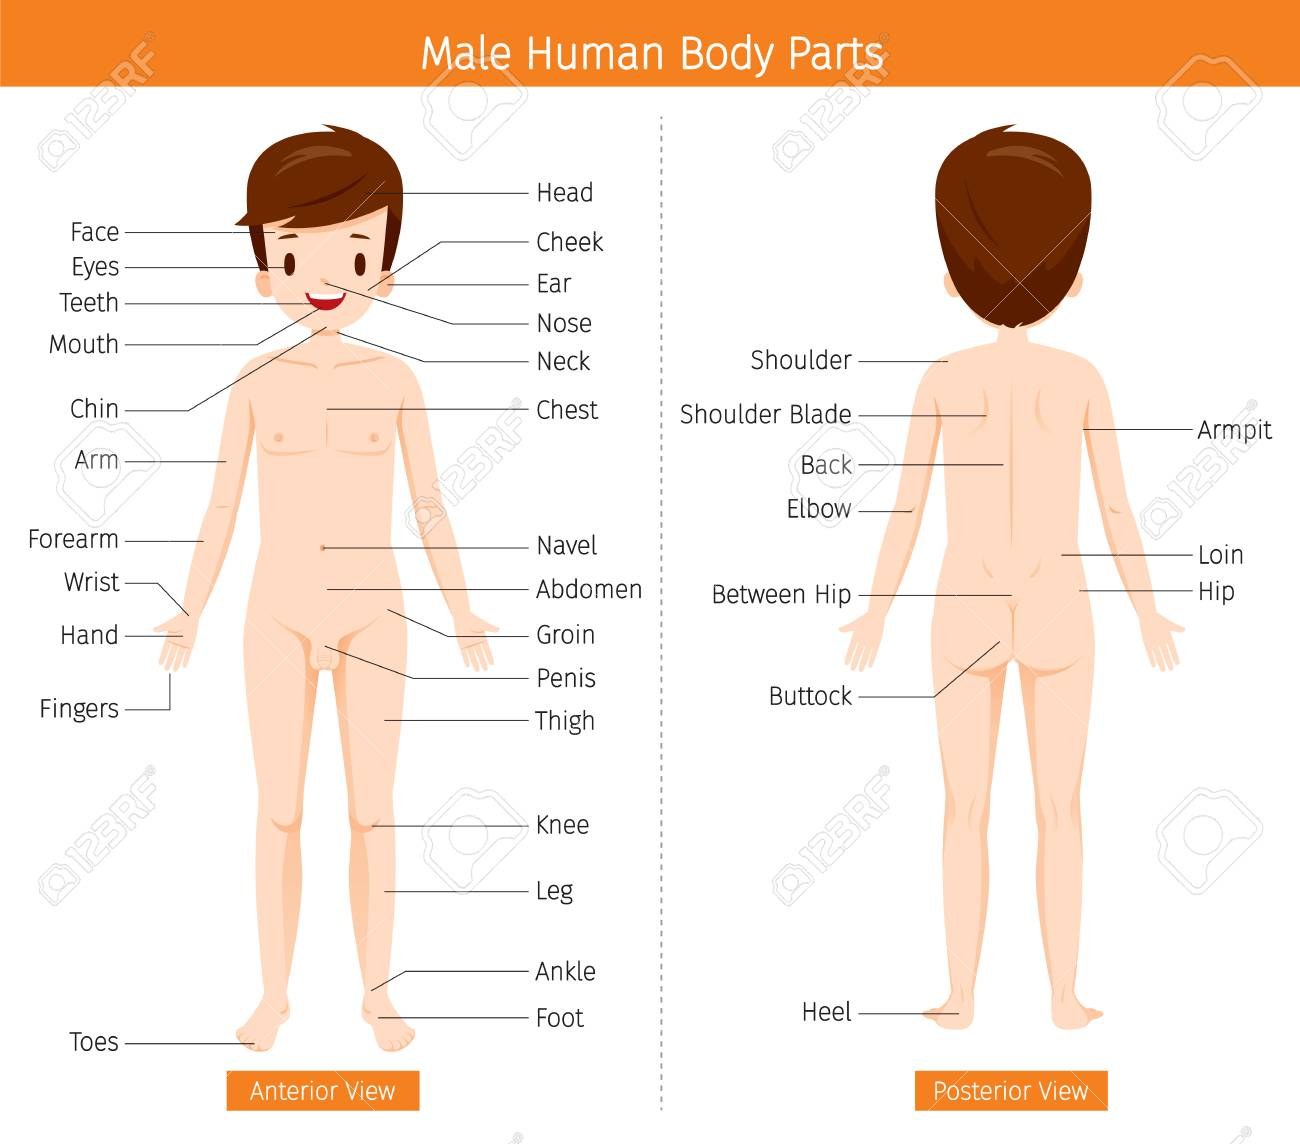 Anatomía Humana Masculina órganos Externos Cuerpo Fisiología Estructura Profesión Médica Morfología Saludable